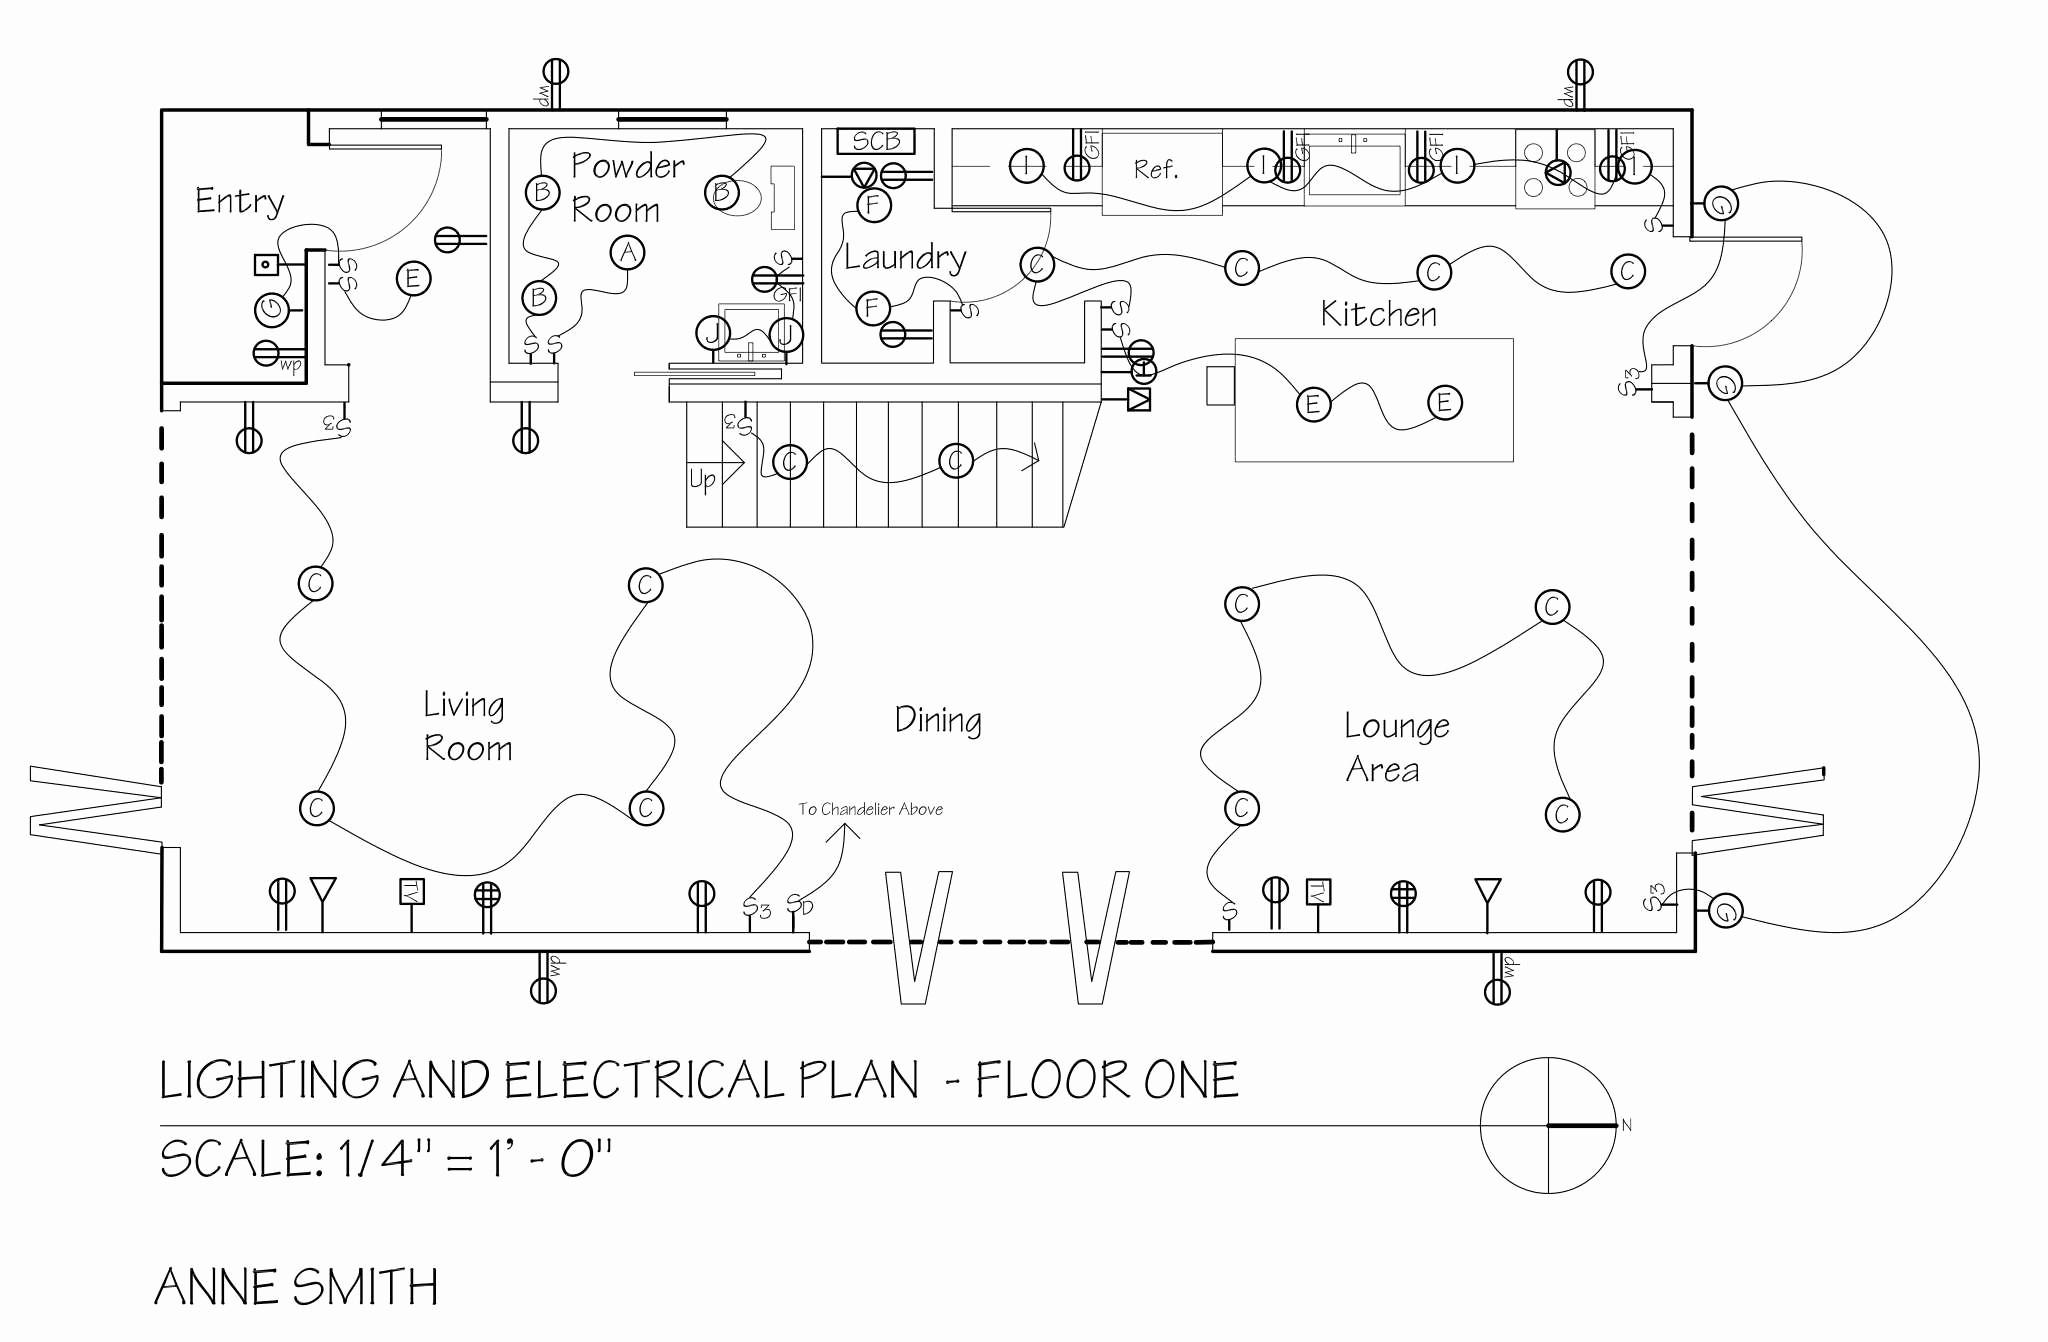 electrical plan light symbol rh 3477  fluorescent light wire diagram electric  fluorescent light wire diagram electric